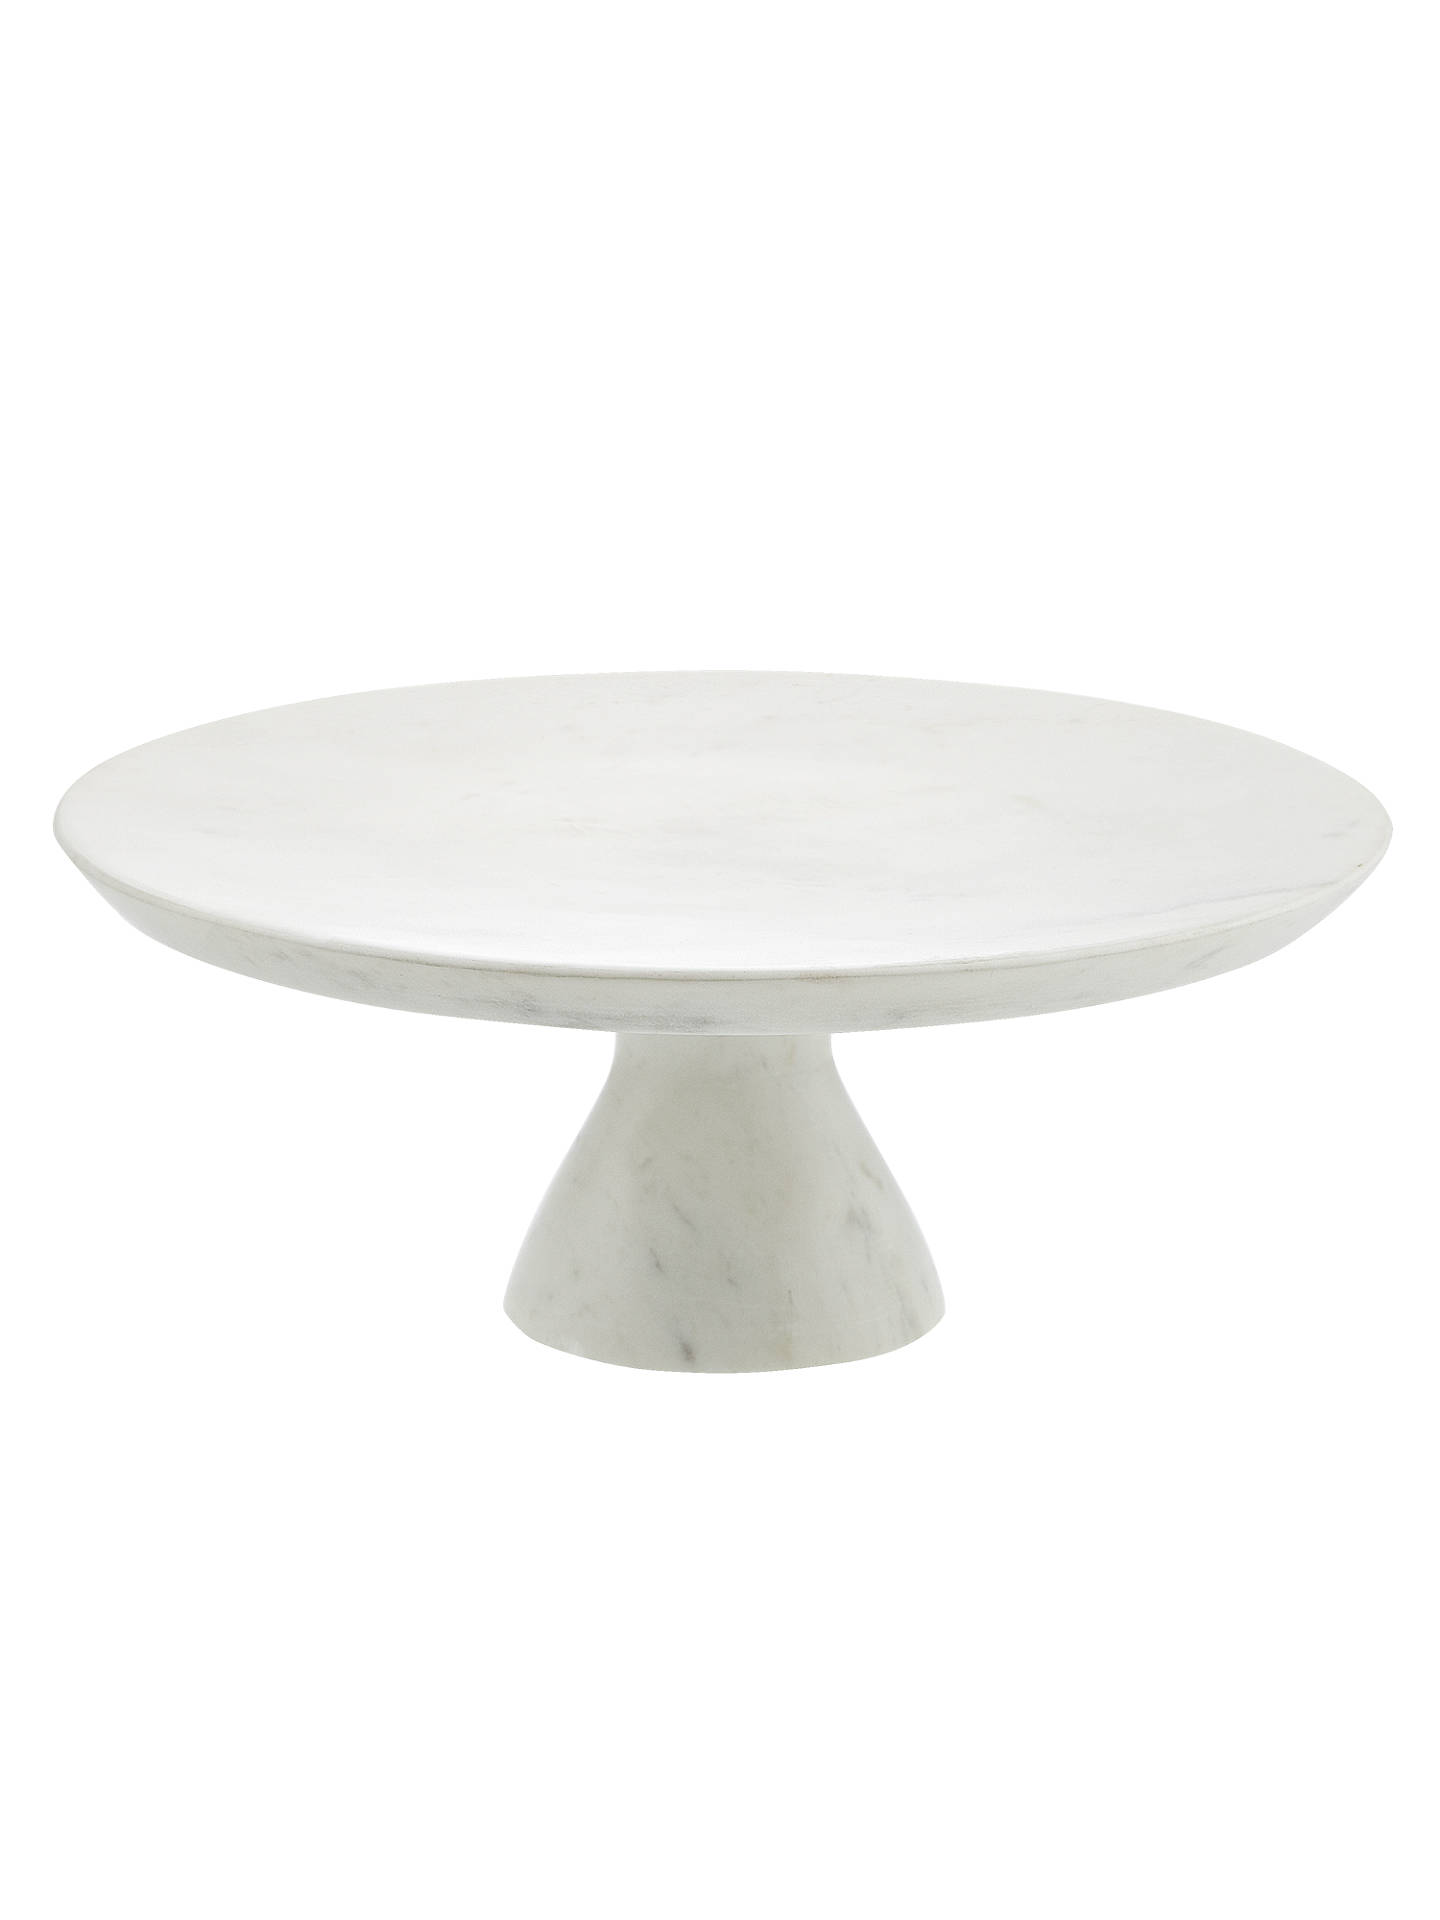 john lewis croft collection marble cake stand at john. Black Bedroom Furniture Sets. Home Design Ideas